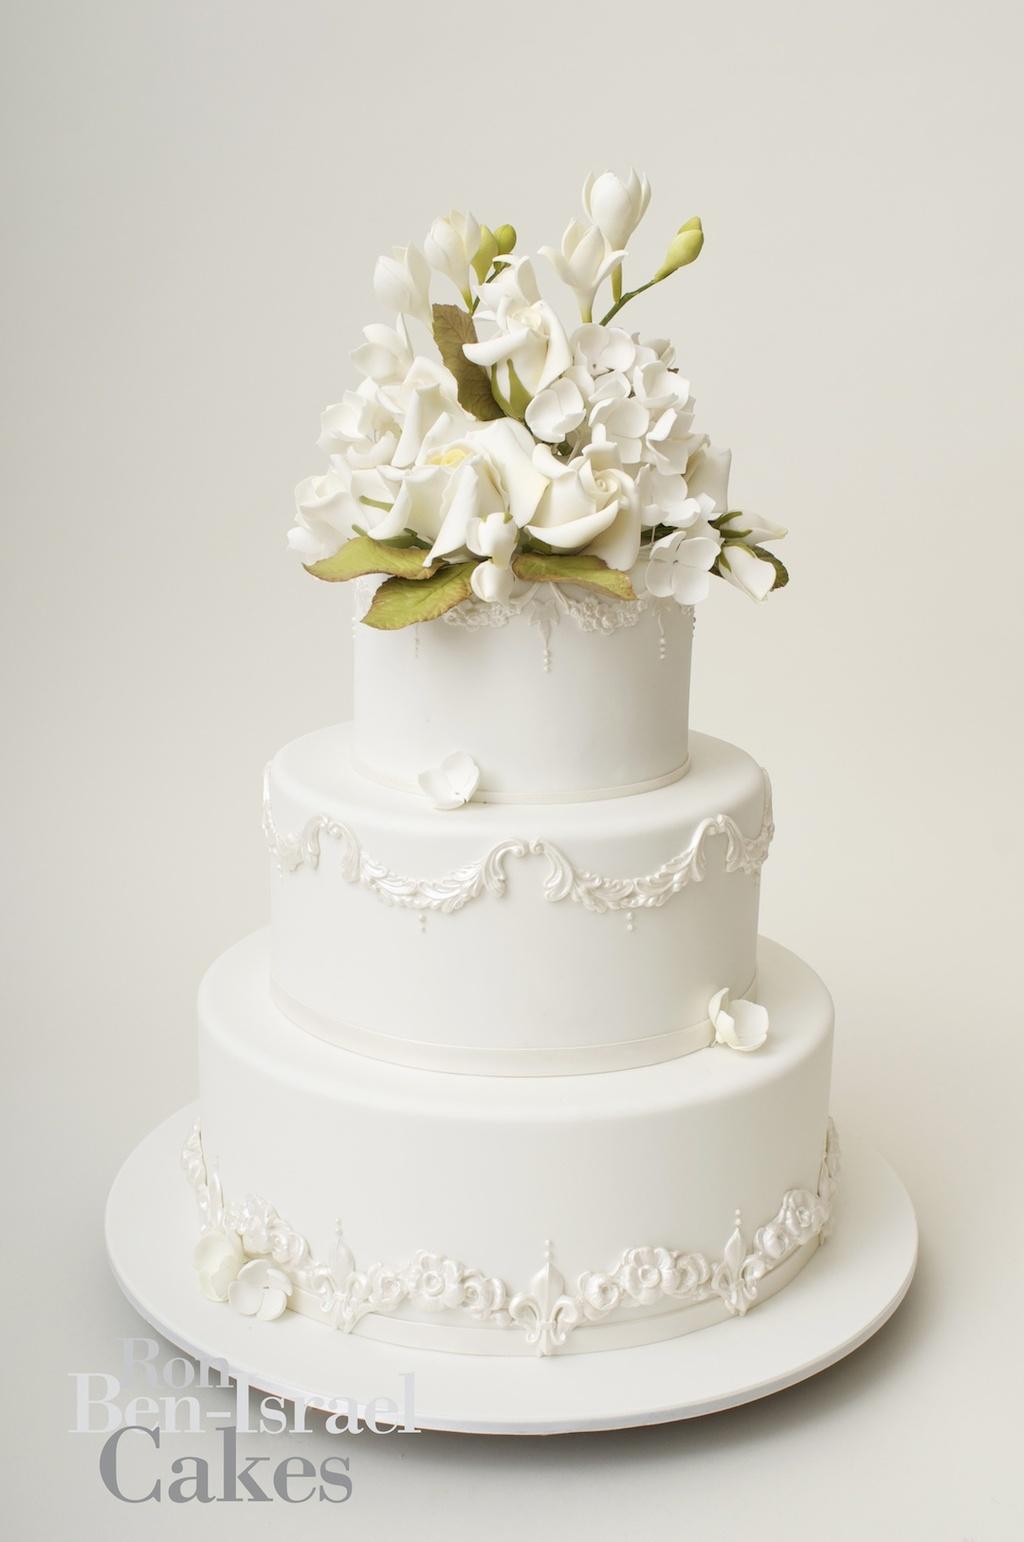 Wedding-cake-inspiration-ron-ben-isreal-wedding-cakes-classic-white-3-tier.full